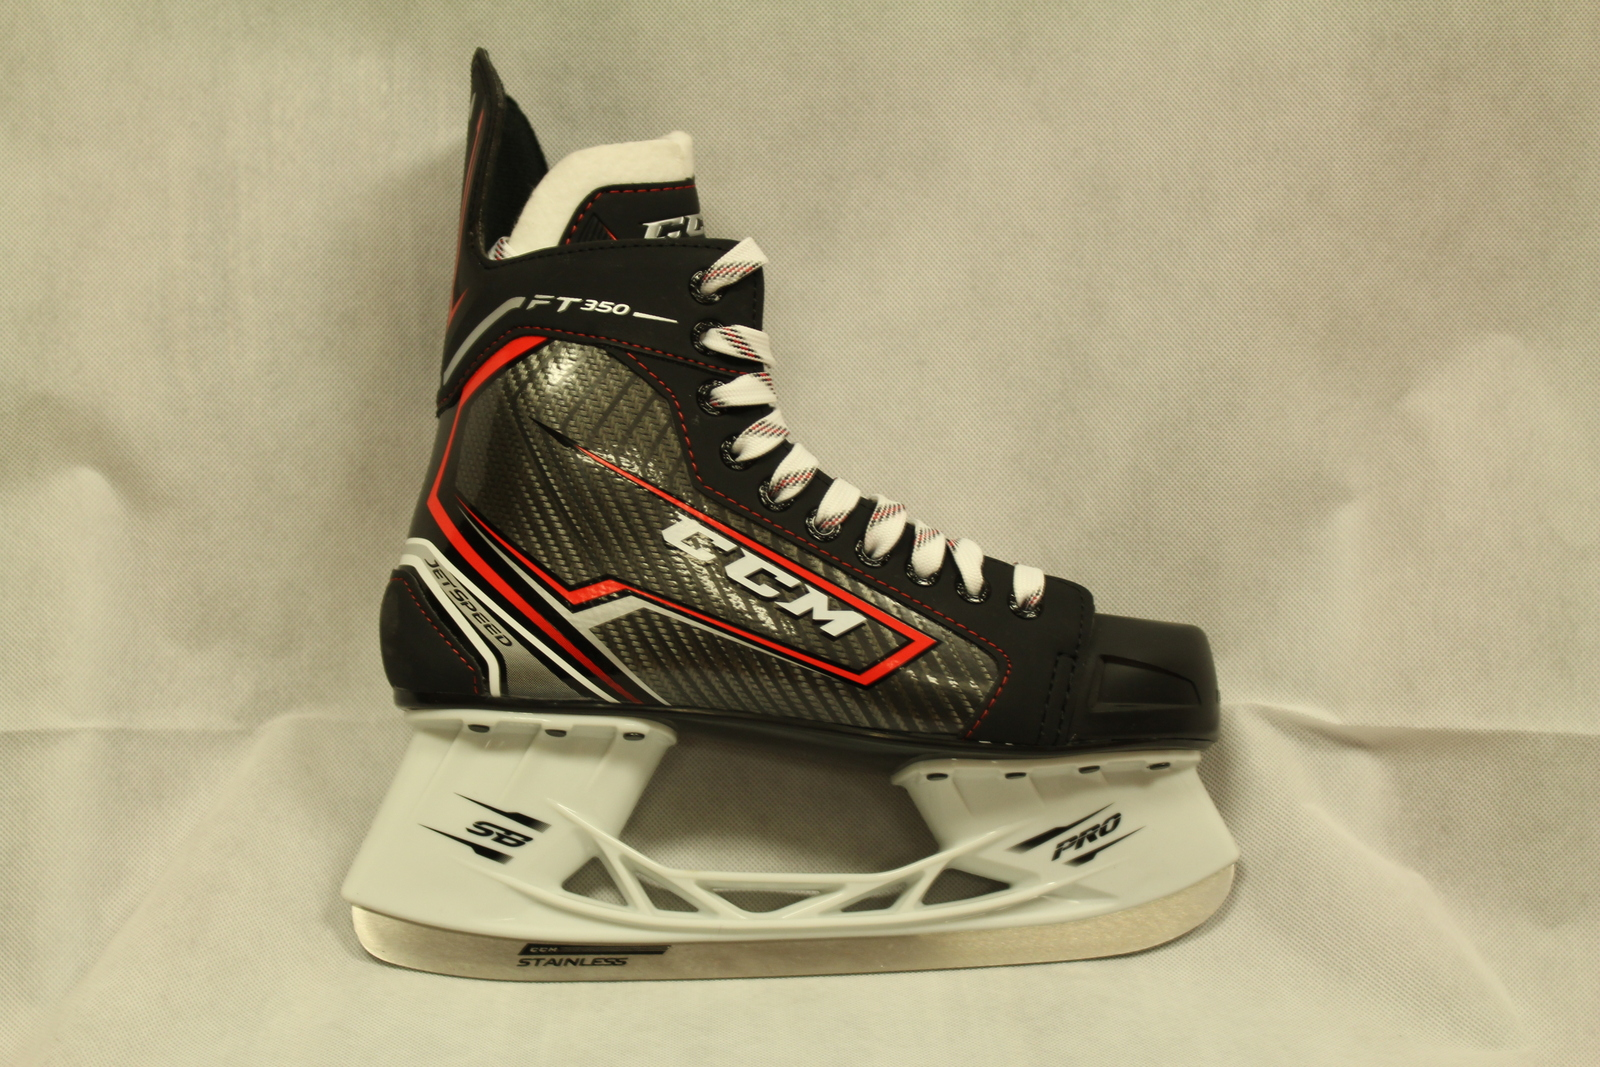 5d7b692abb4 CCM Jetspeed FT350 Senior Hockey Skates Size and similar items